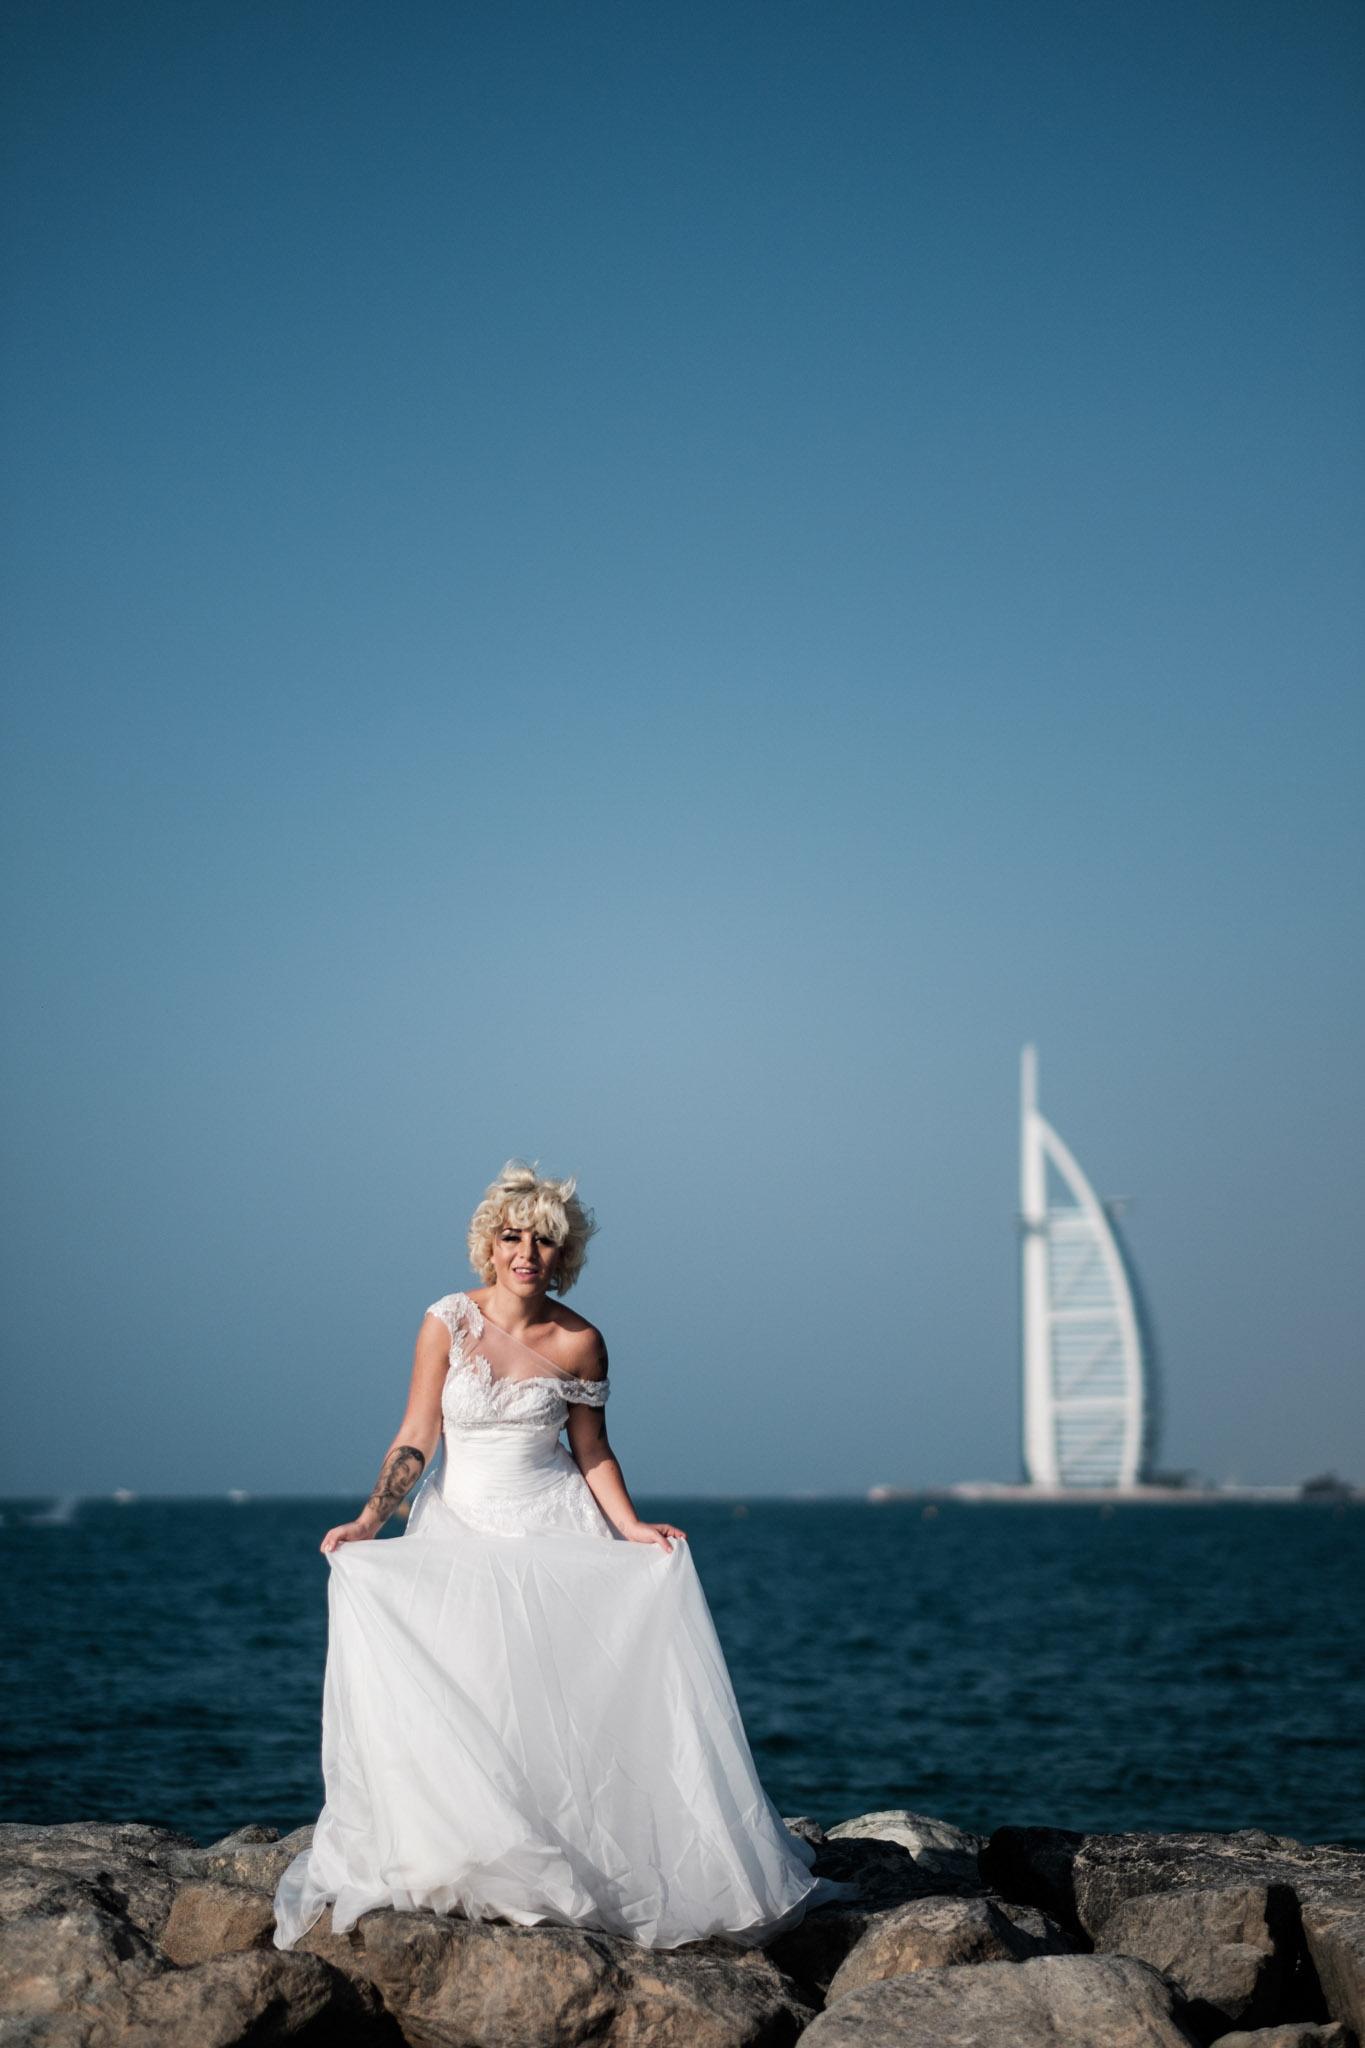 capri-sposa-wedding-dresses-october-2nd-2015-293_21757153848_o ...